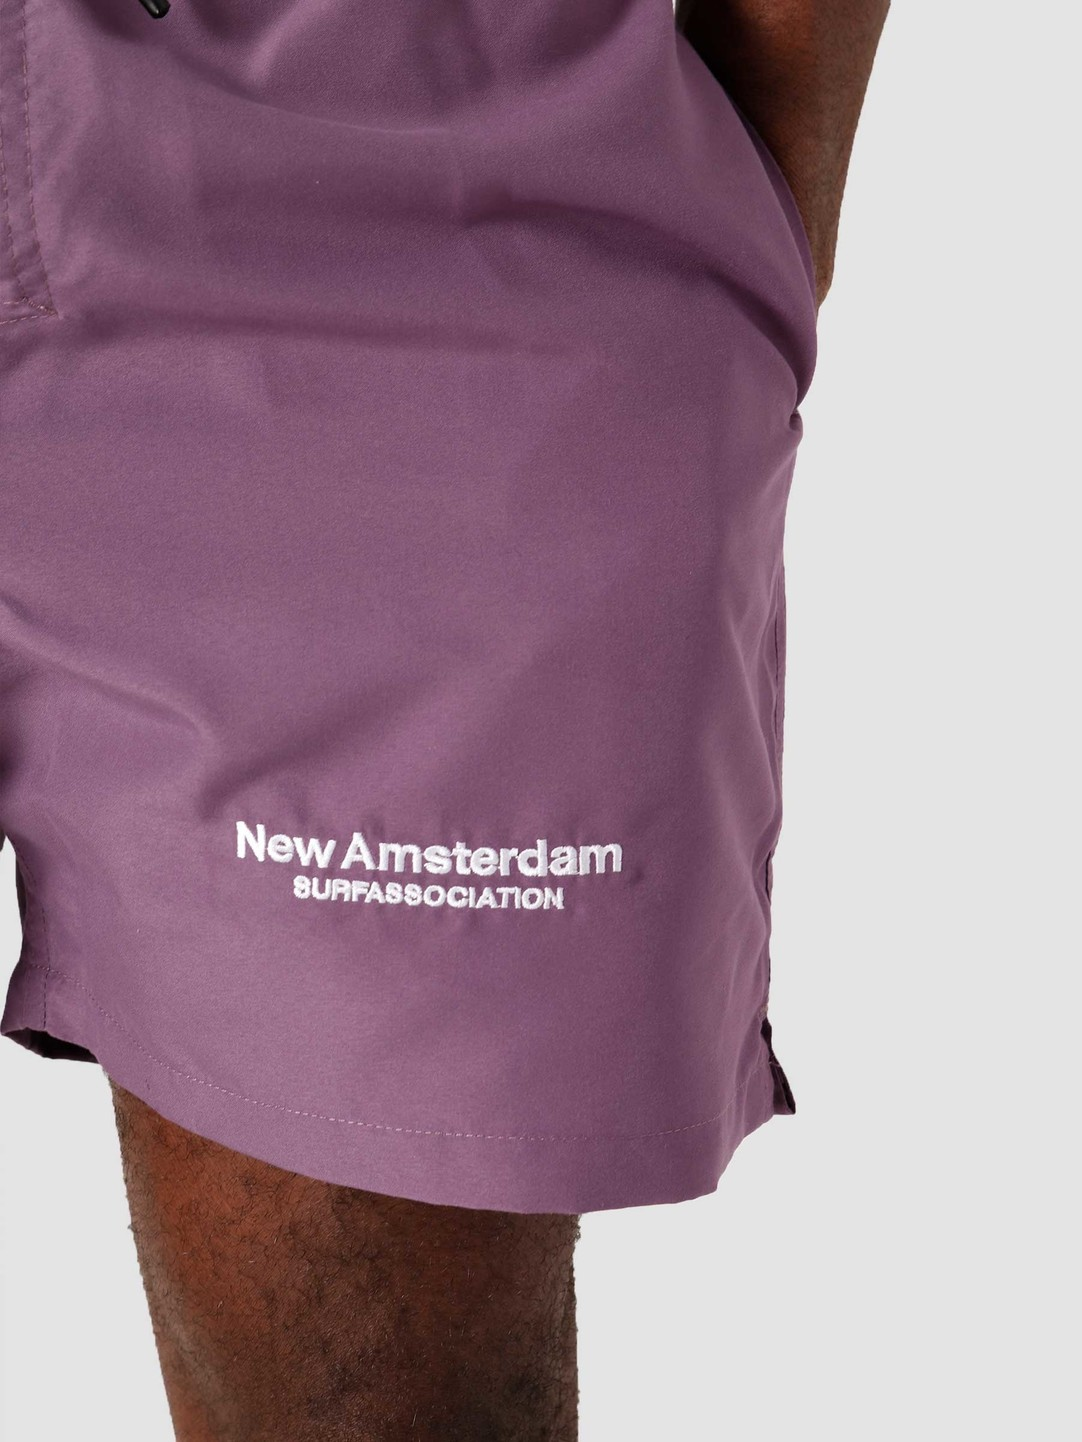 New Amsterdam Surf Association New Amsterdam Surf association Logo Short Grape Ss21 2021026